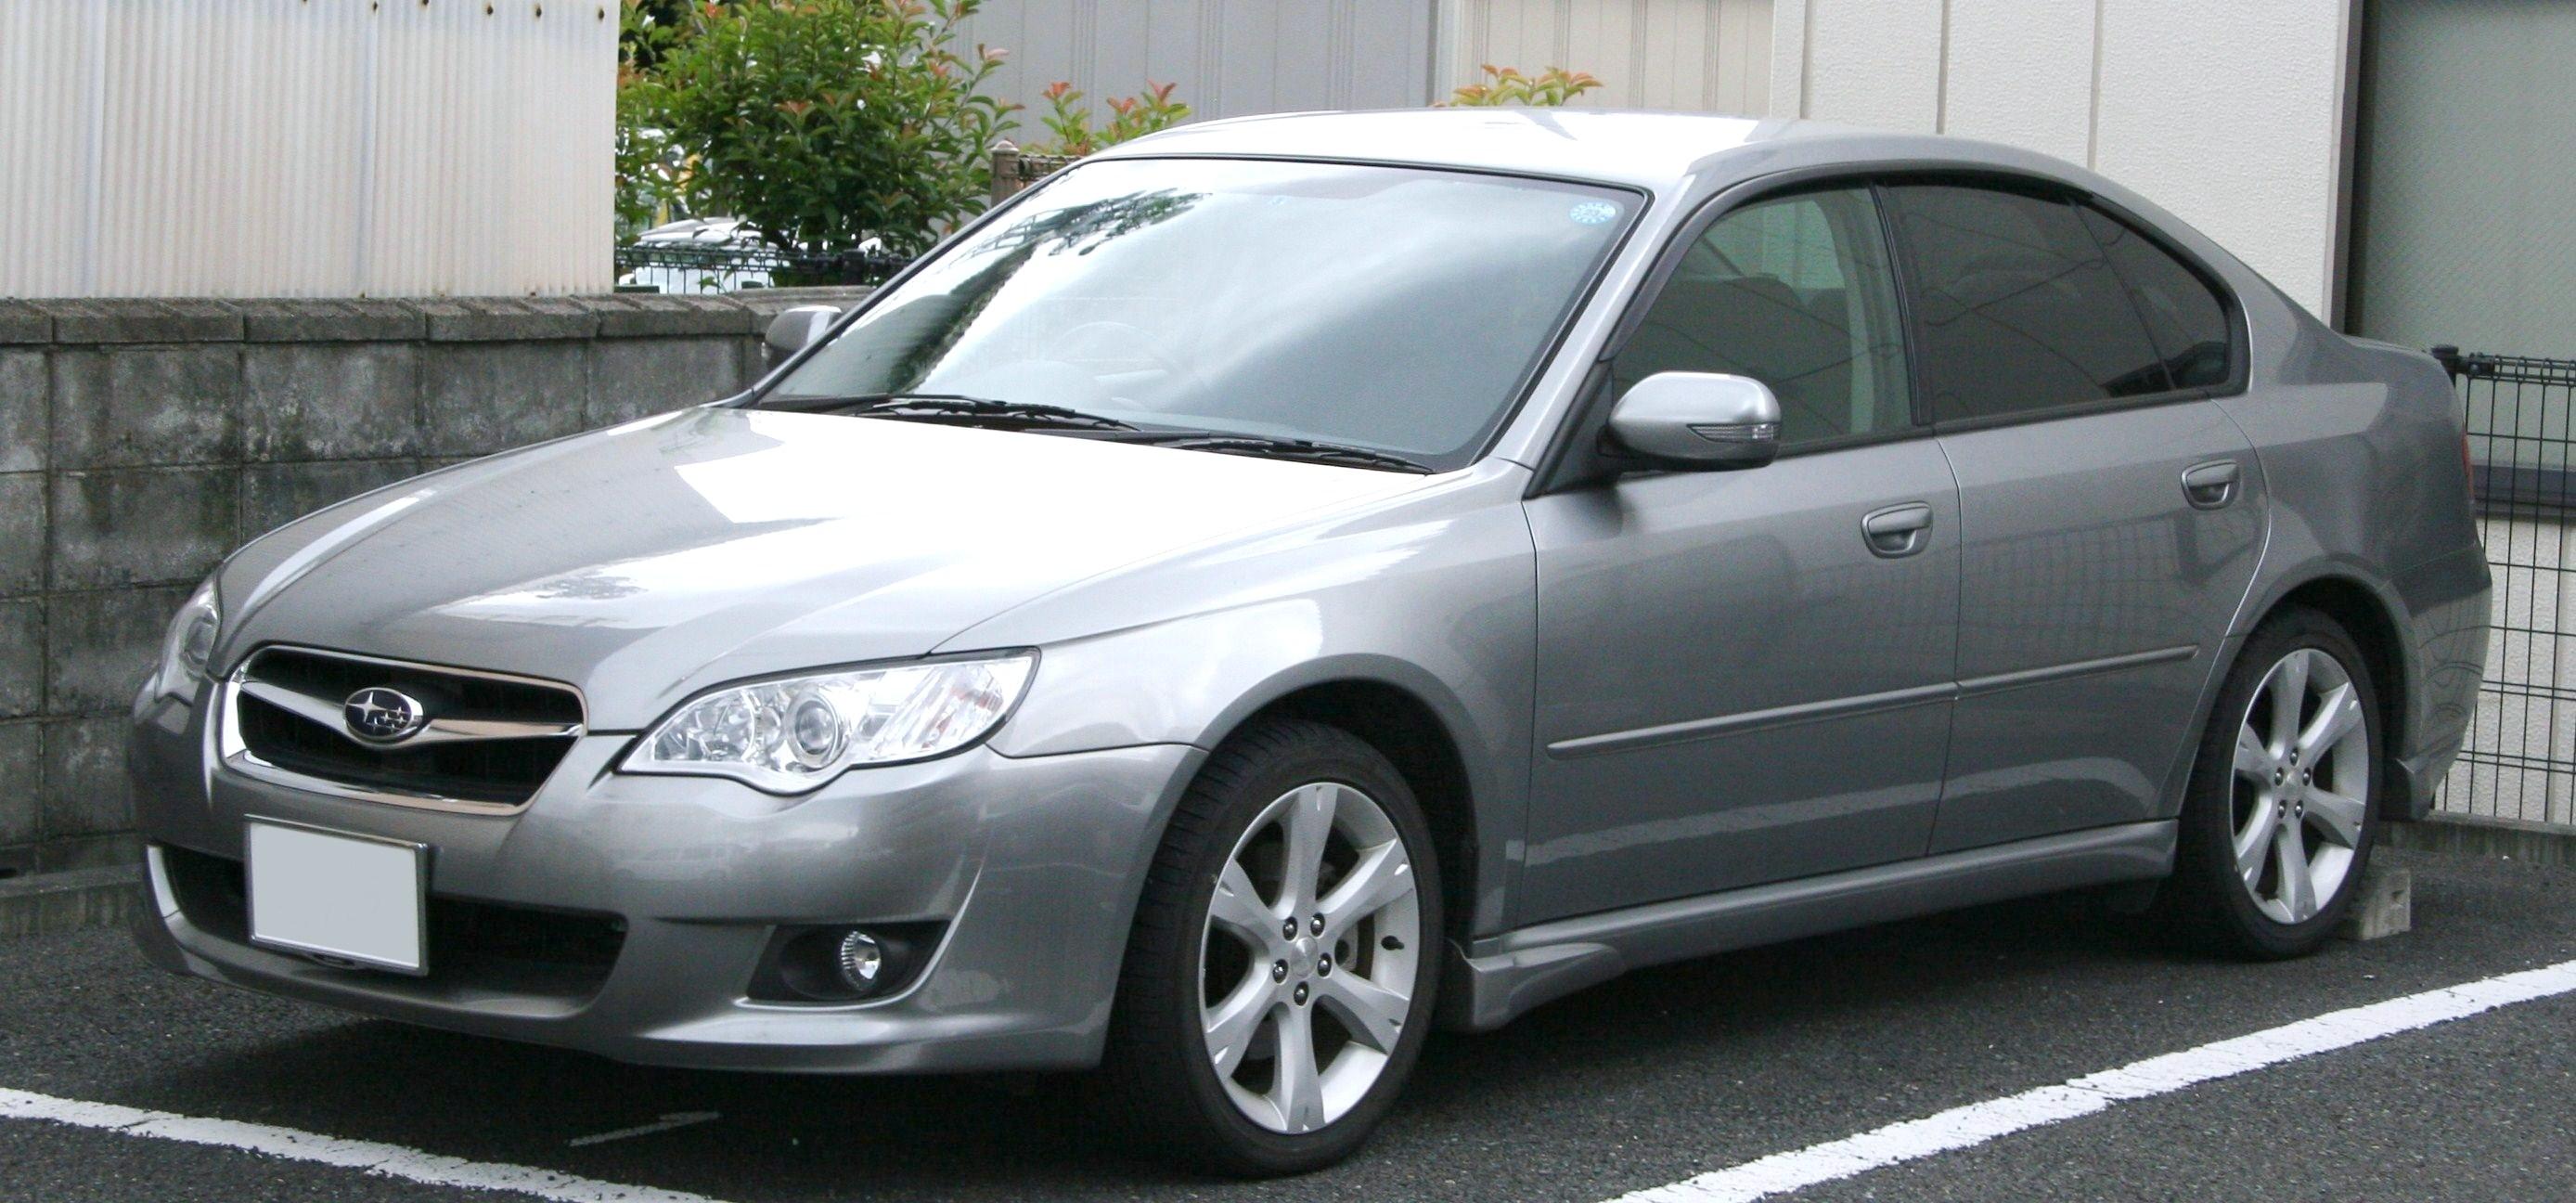 Subaru_Legacy_B4_BL